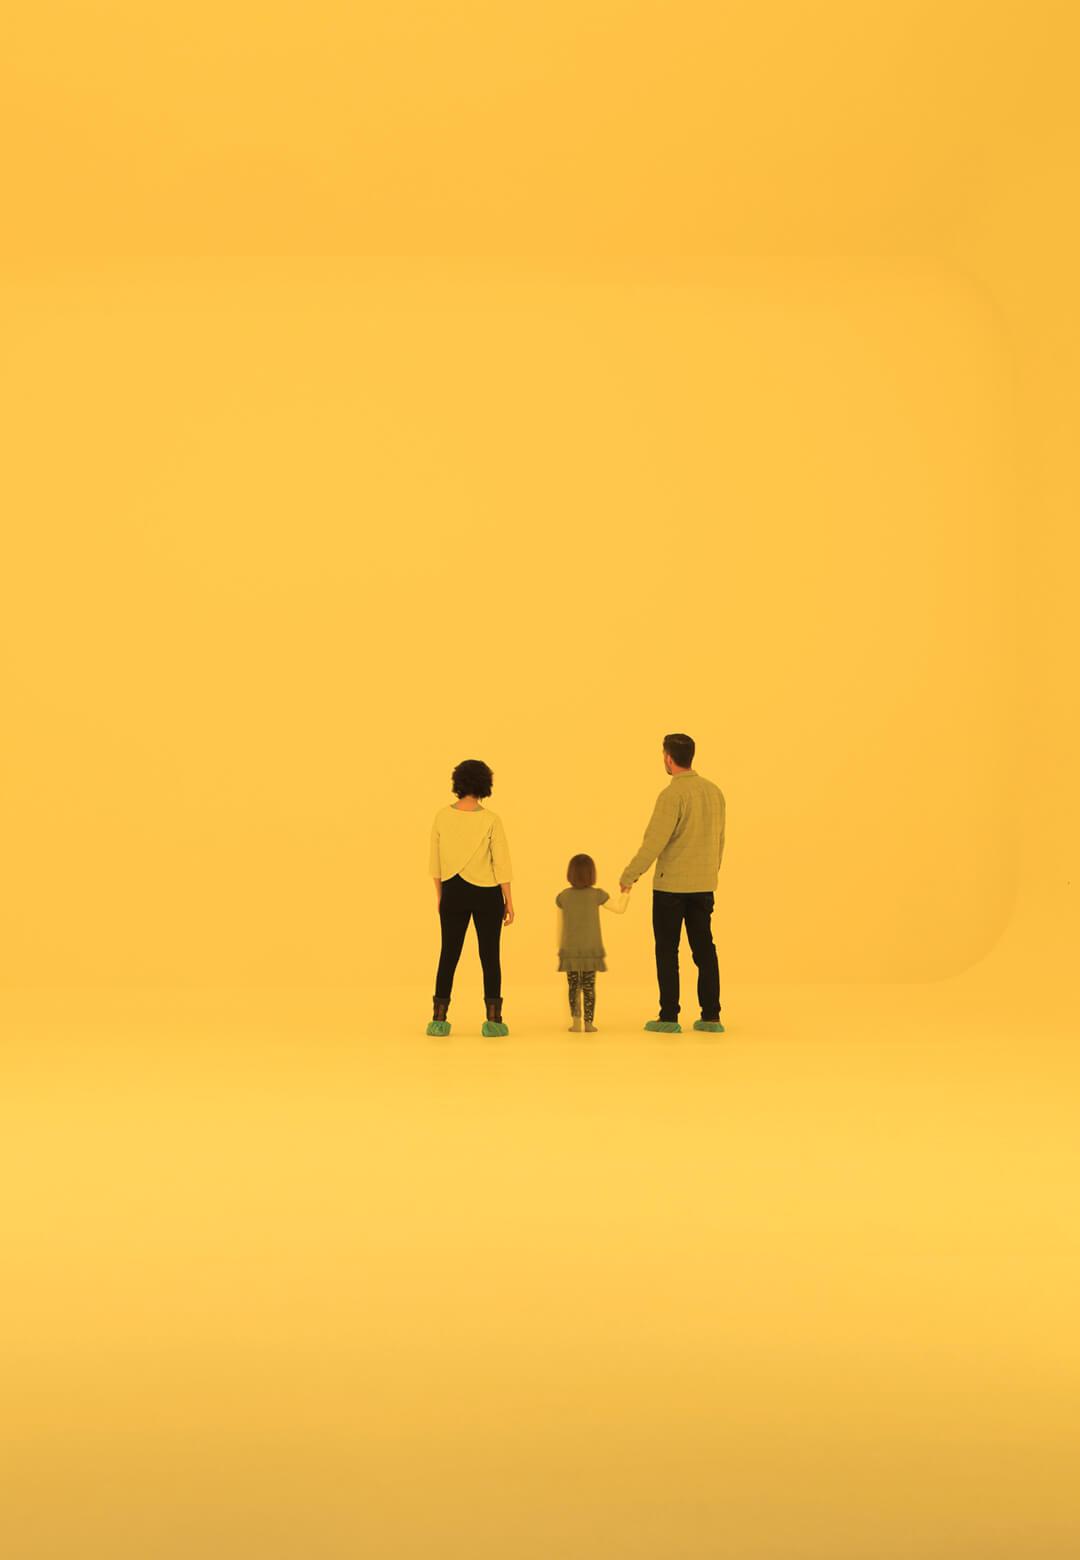 Perfectly Clear (Ganzfeld)| James Turrell retrospective at MASS MoCA | STIRworld